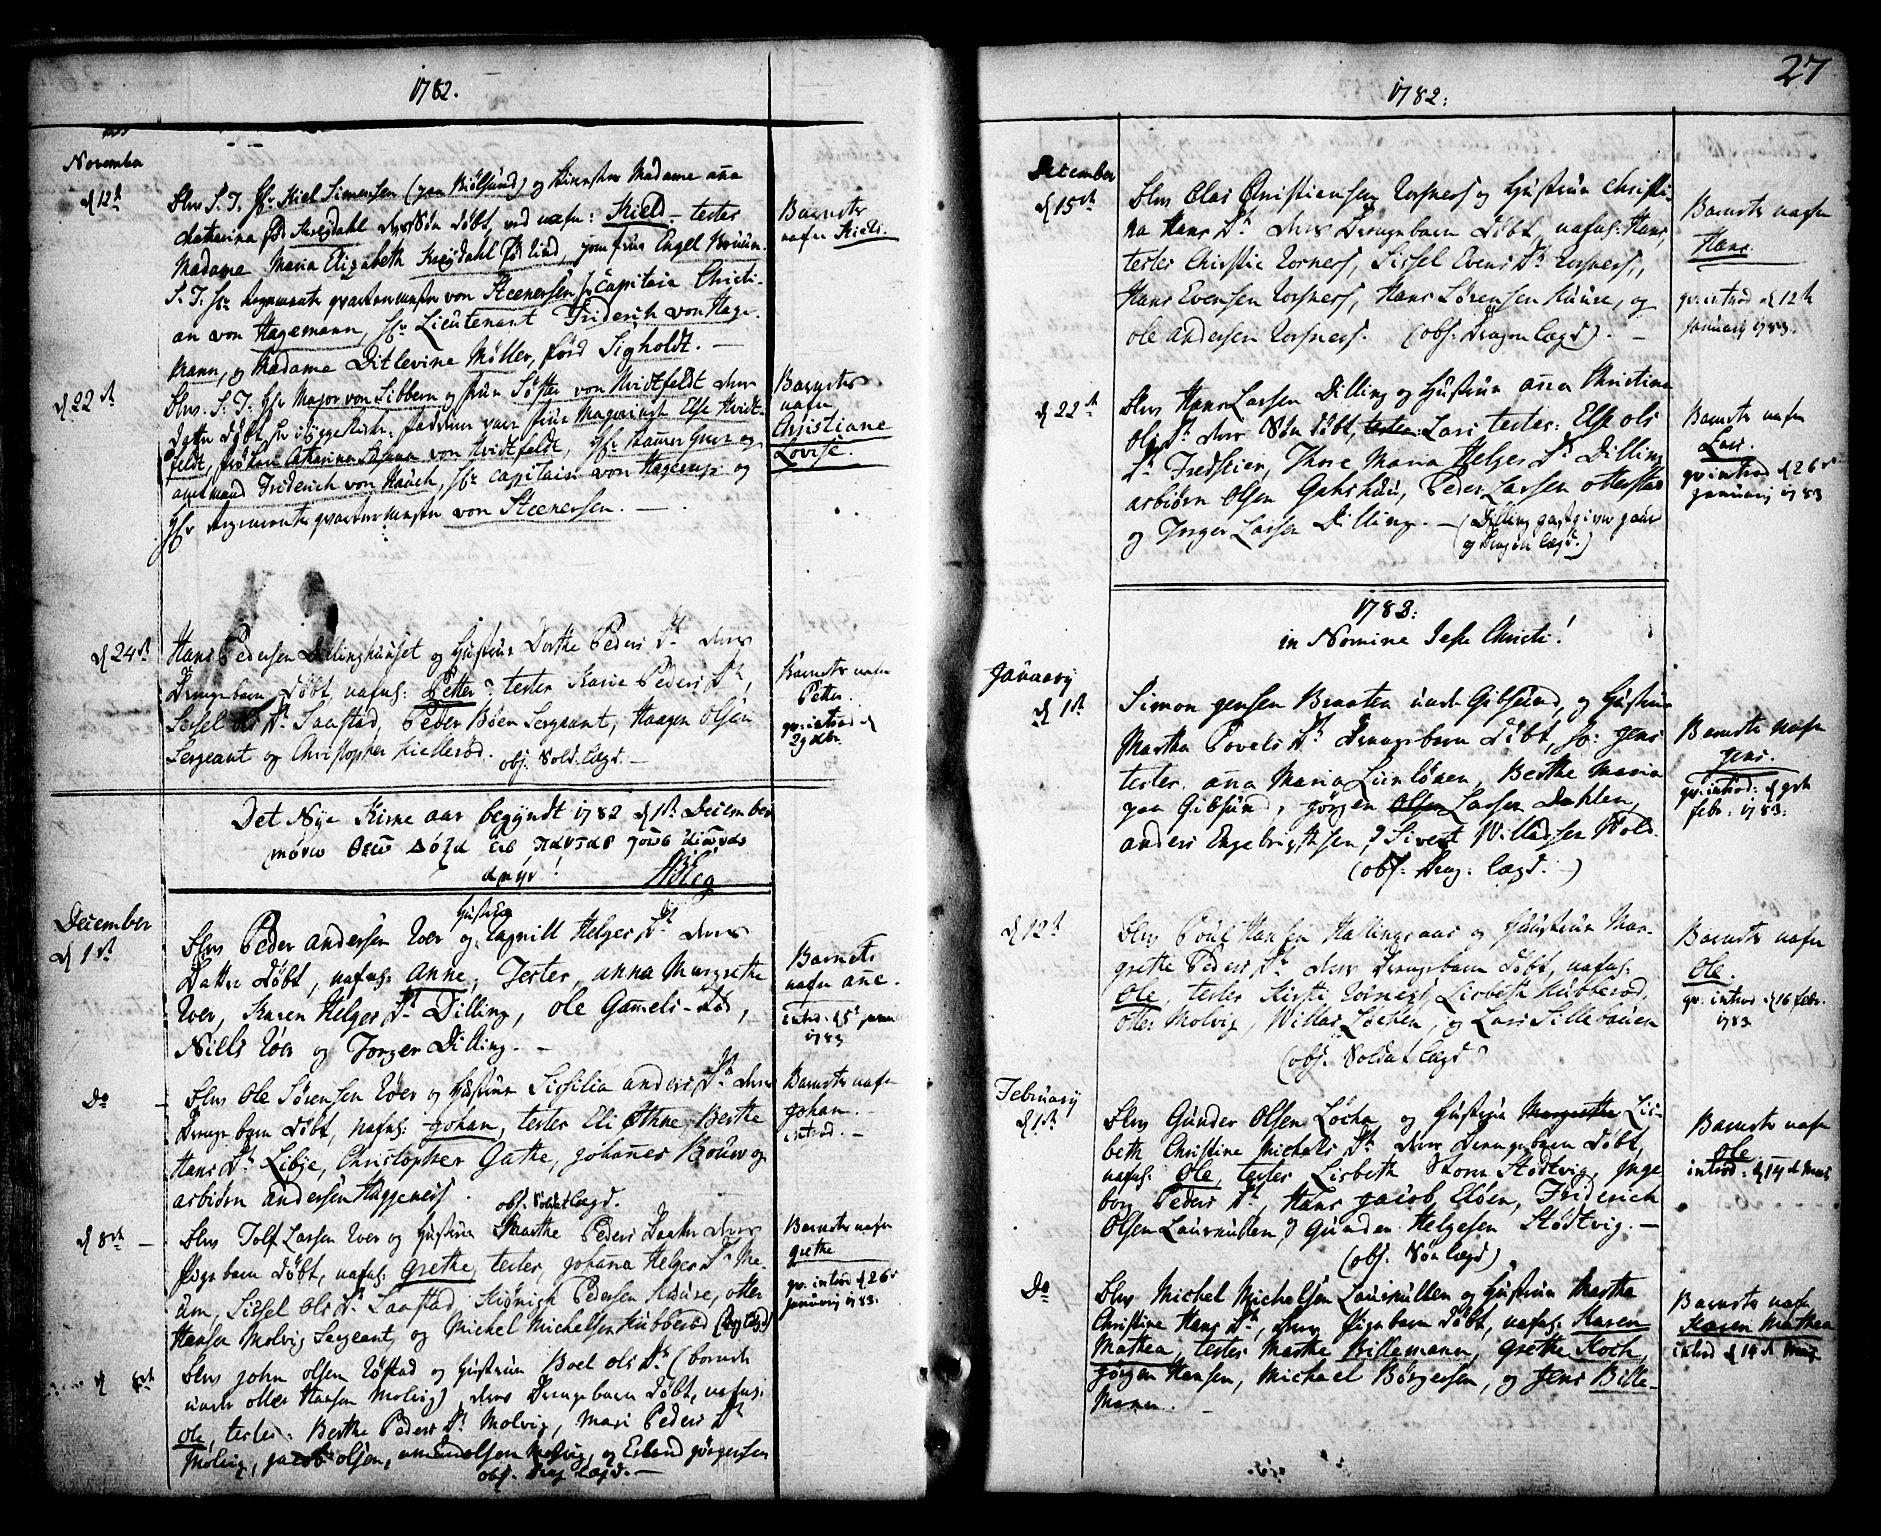 SAO, Rygge prestekontor Kirkebøker, F/Fa/L0002: Parish register (official) no. 2, 1771-1814, p. 27